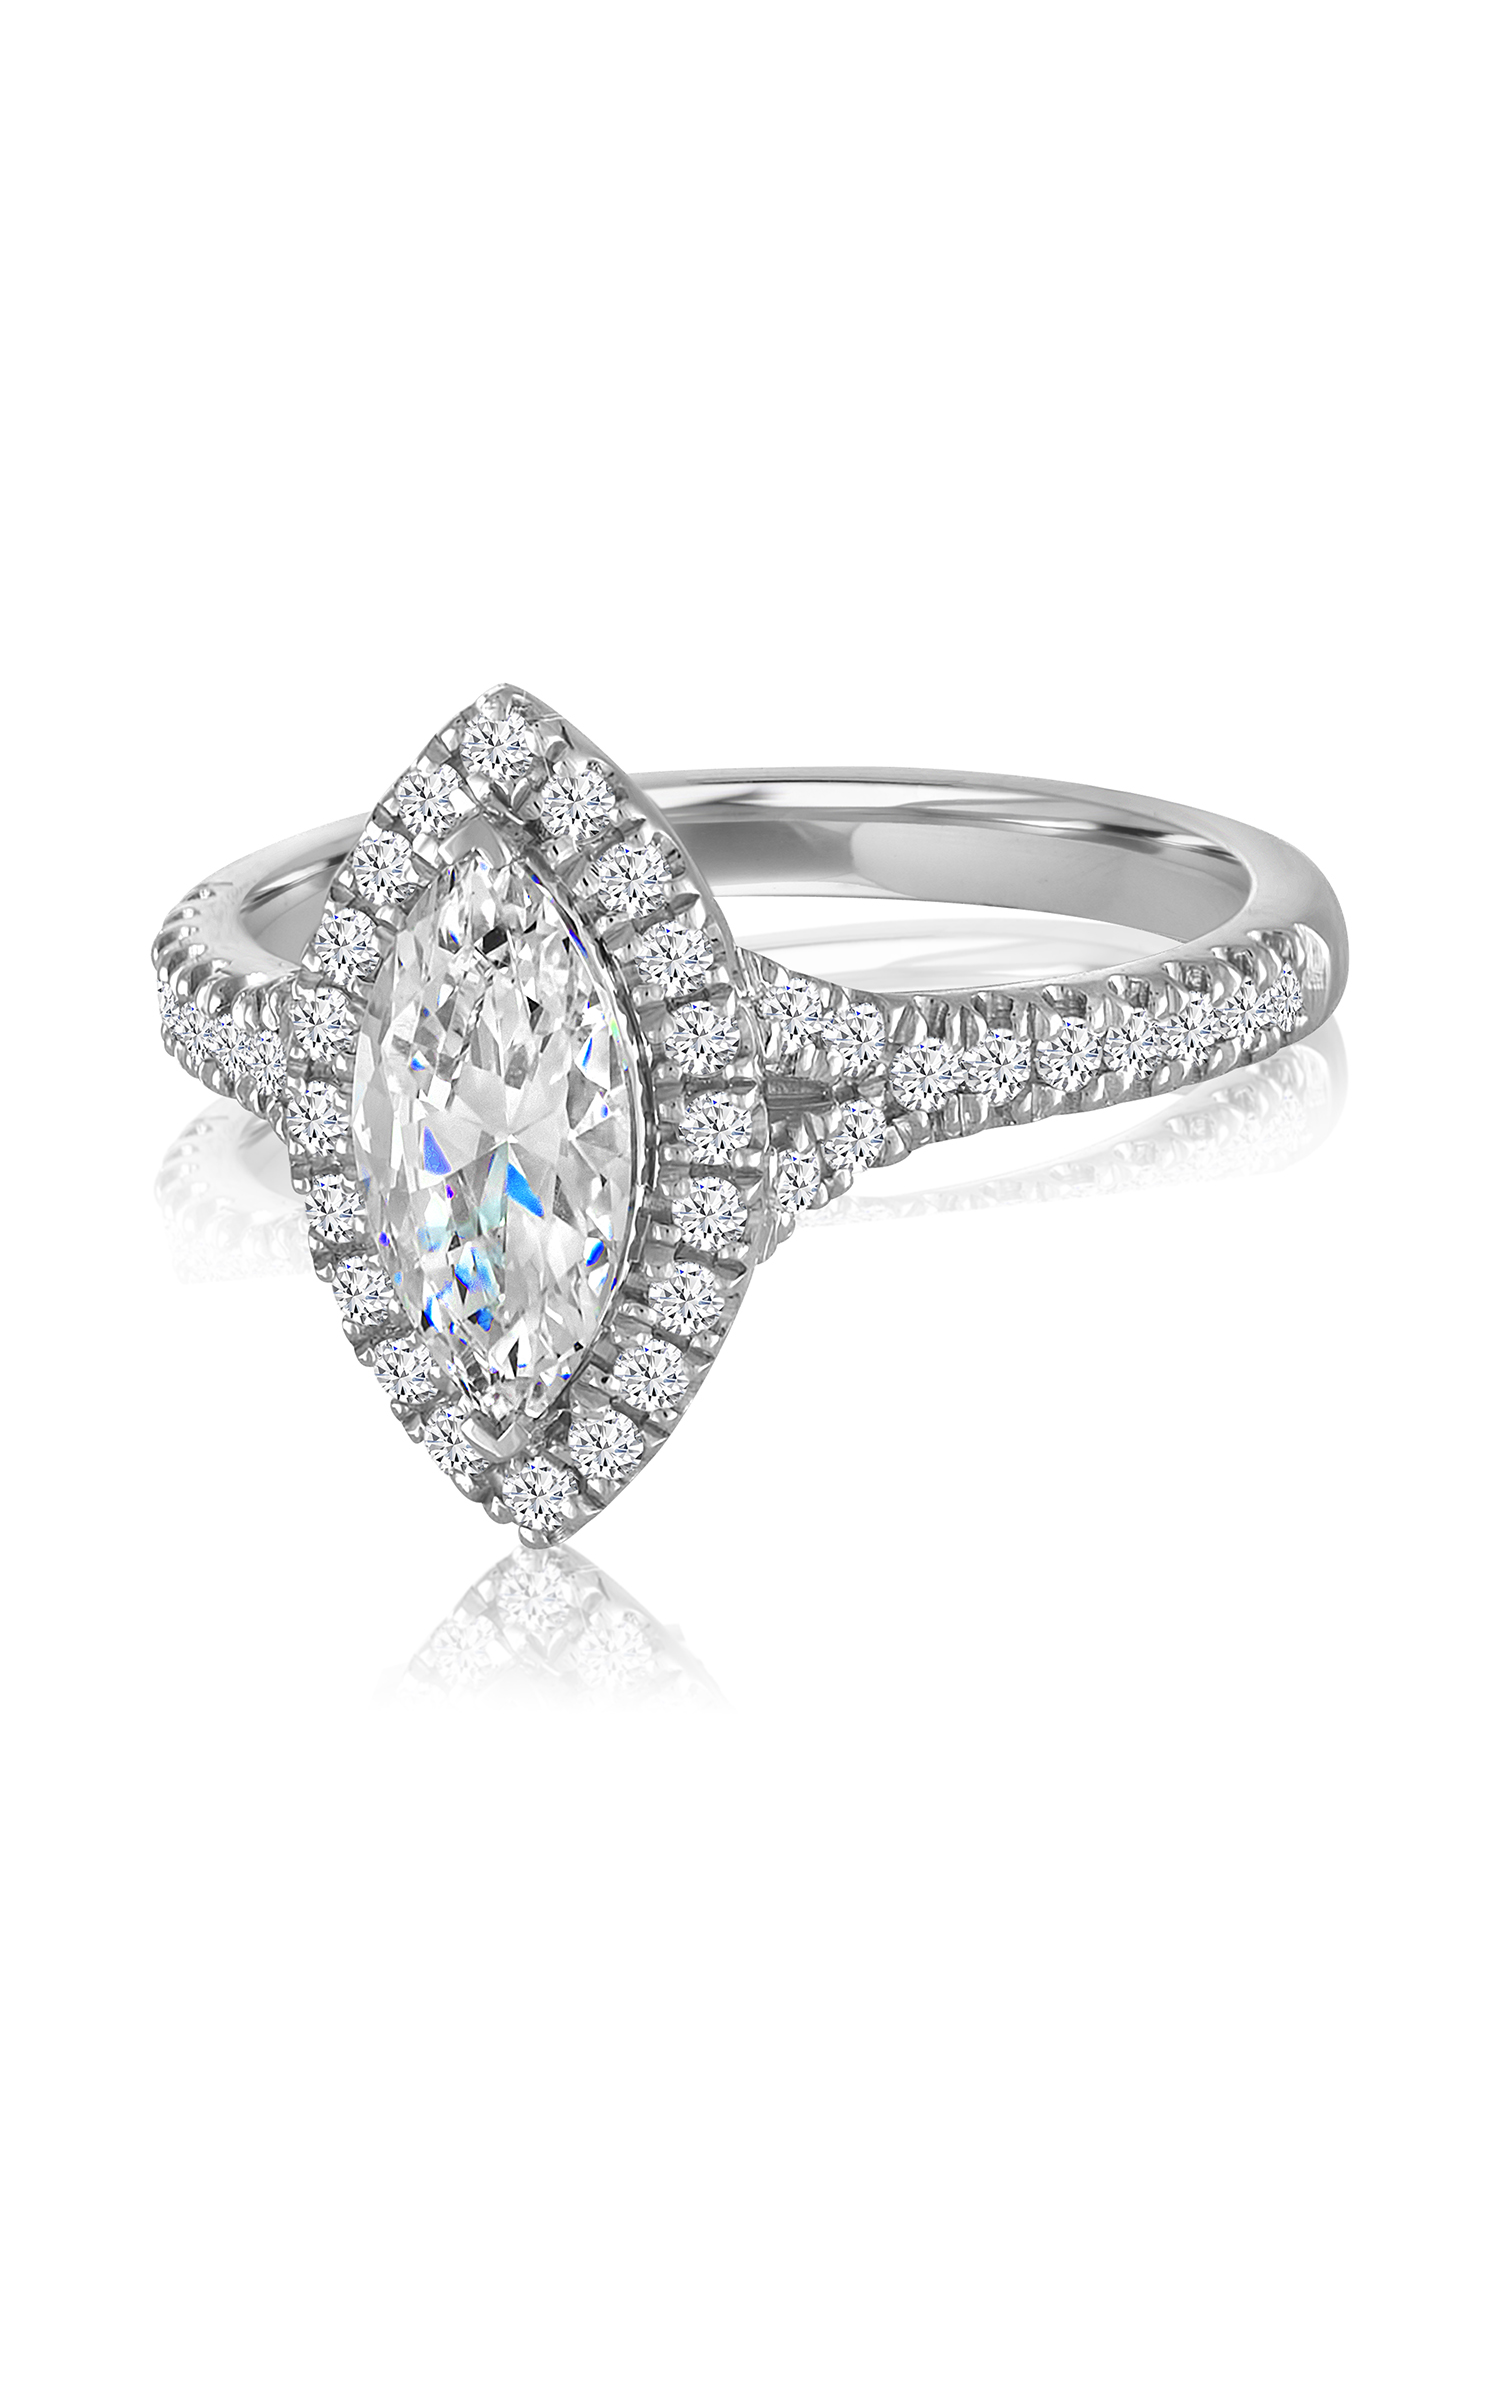 Imagine Bridal Engagement Rings 62216D-1 5 product image